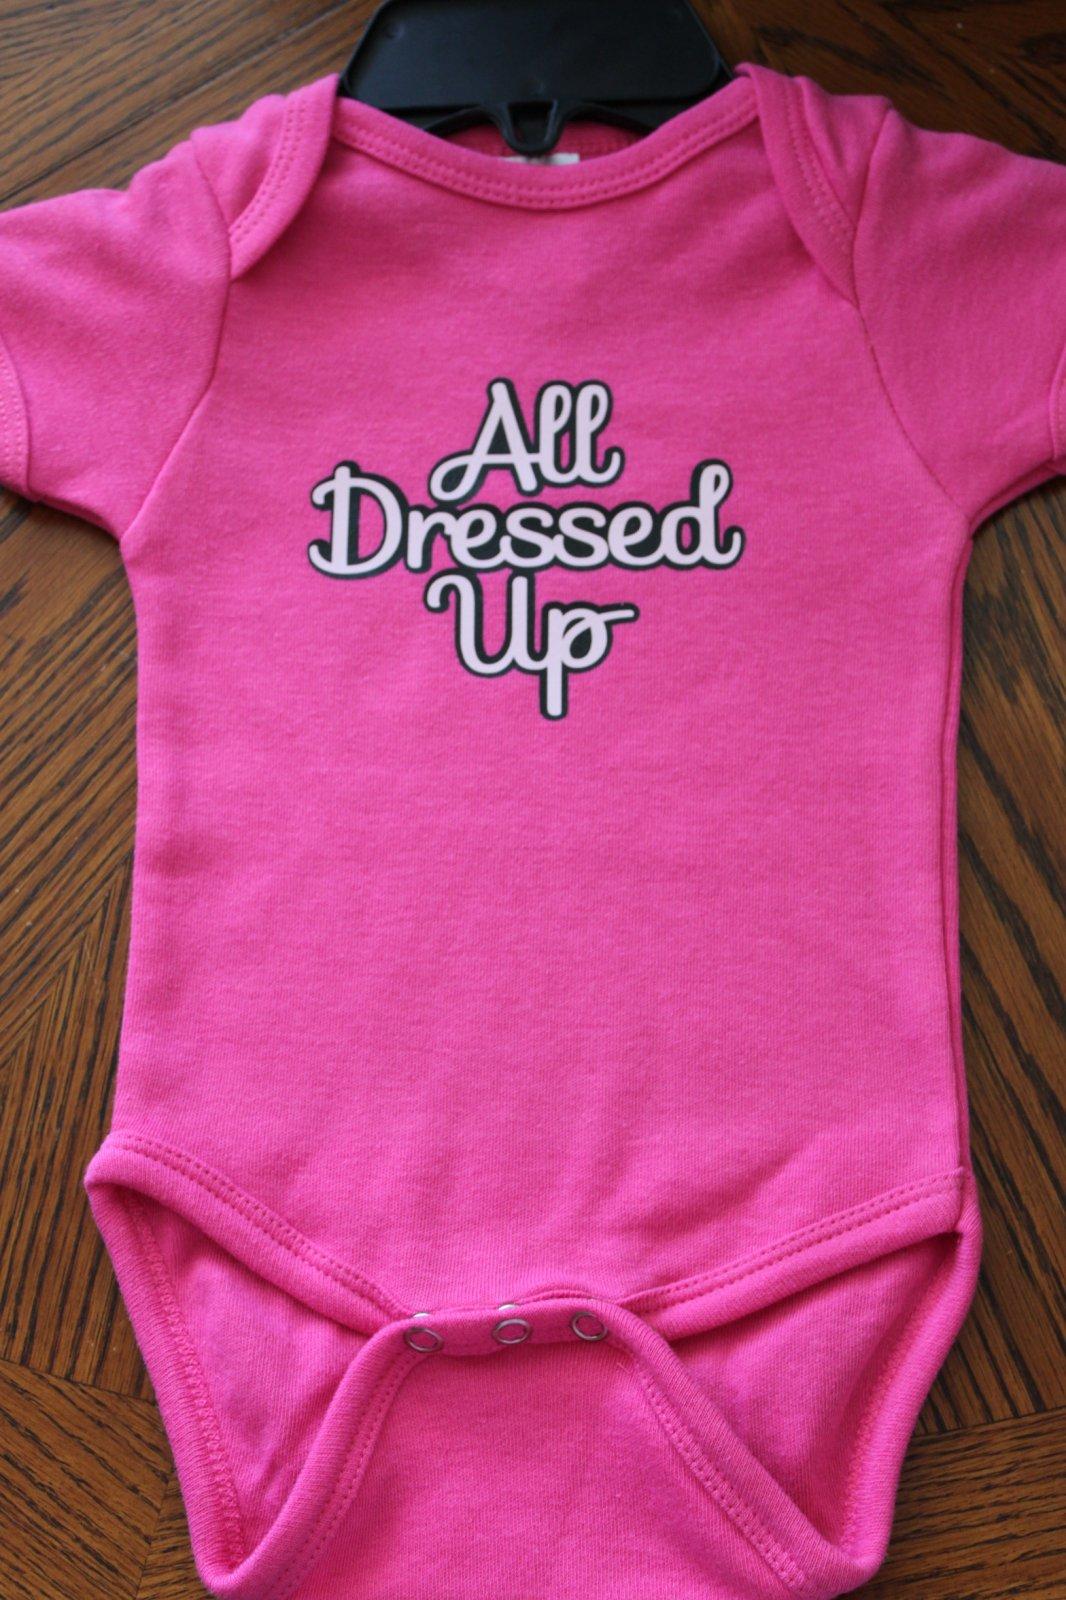 Dark Pink Onesie - All Dressed Up 6-12 mo